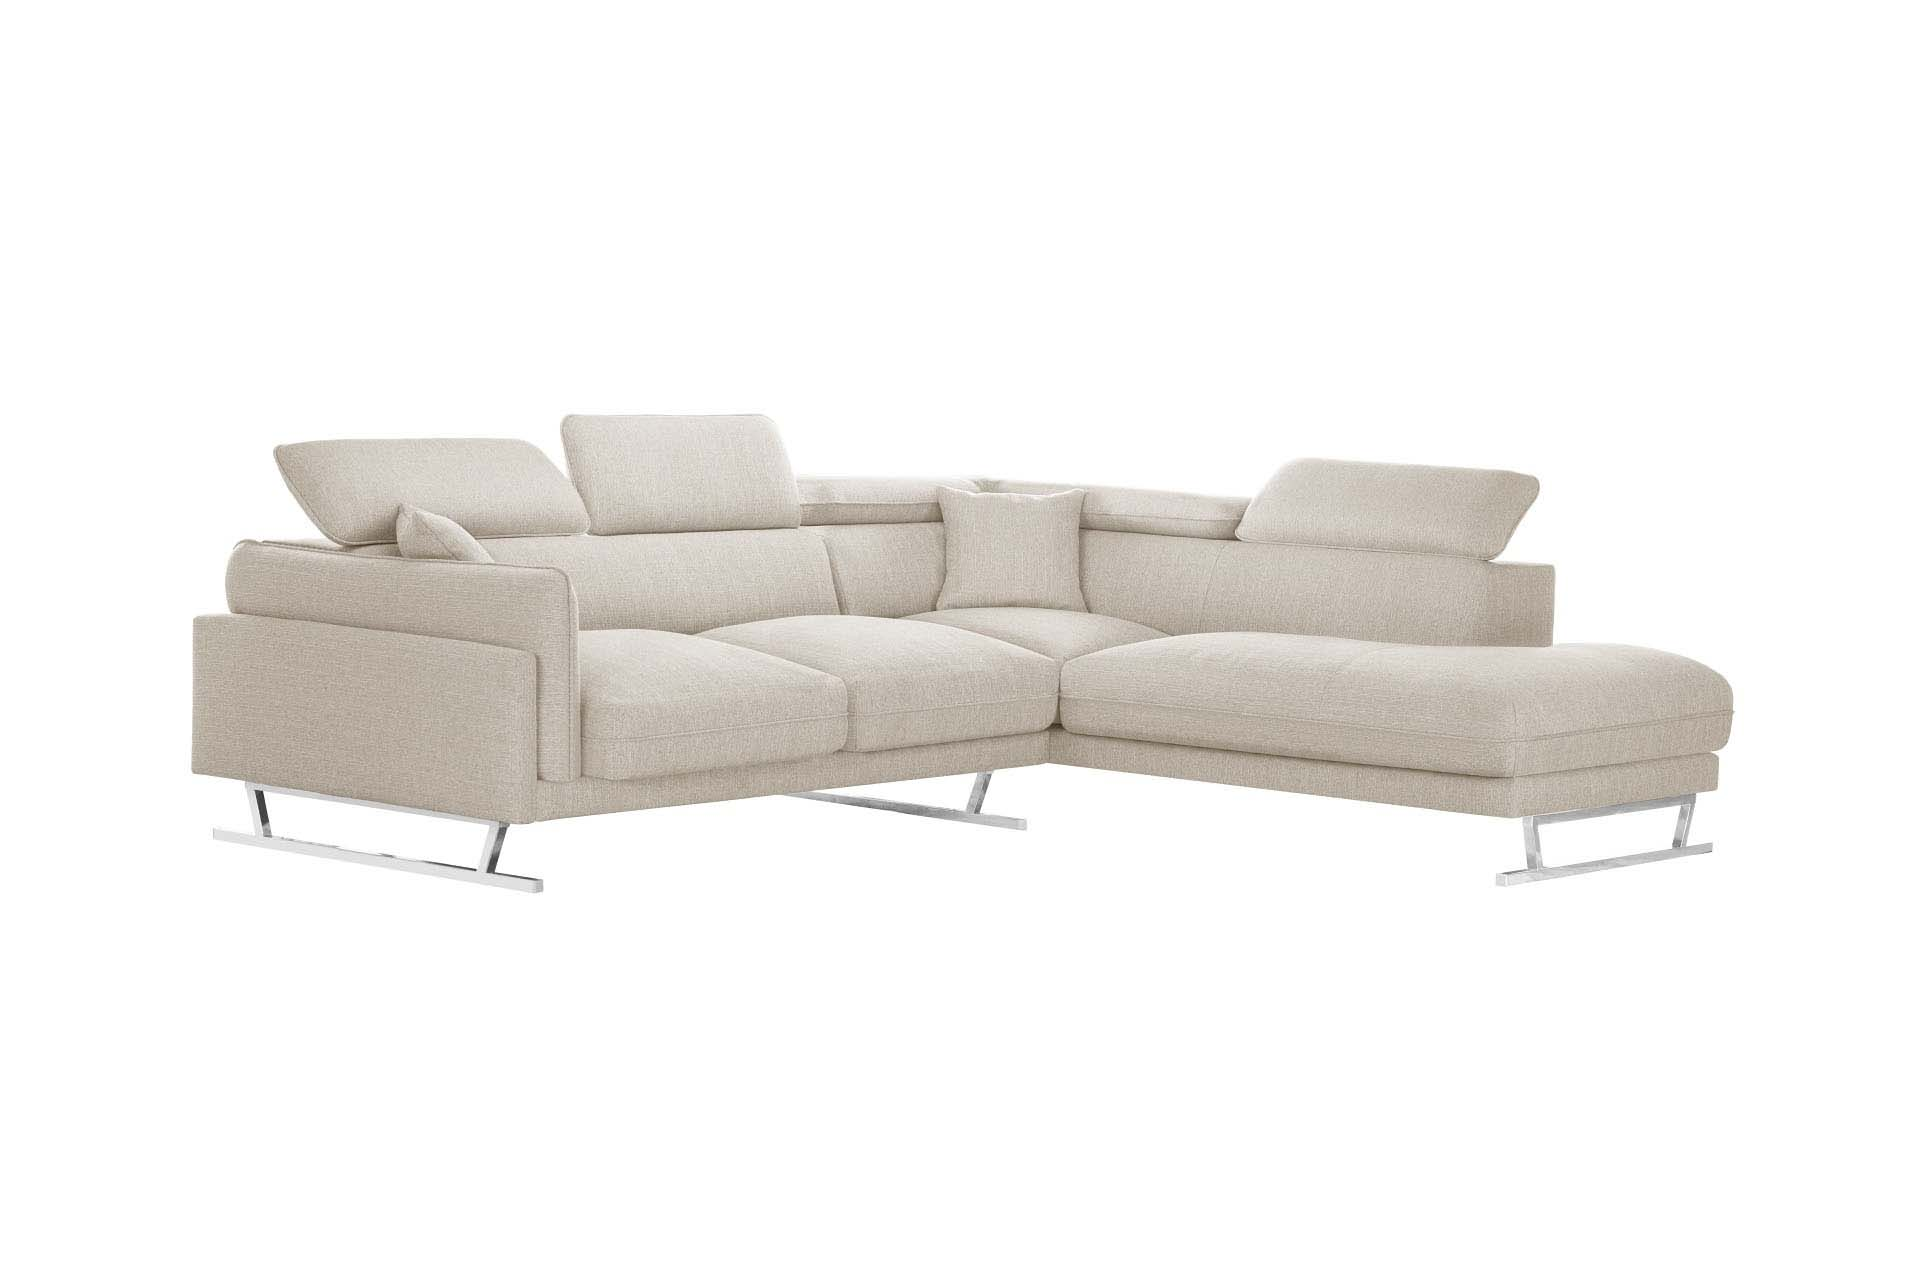 Canapé d'angle 6 places Tissu Luxe Design Confort